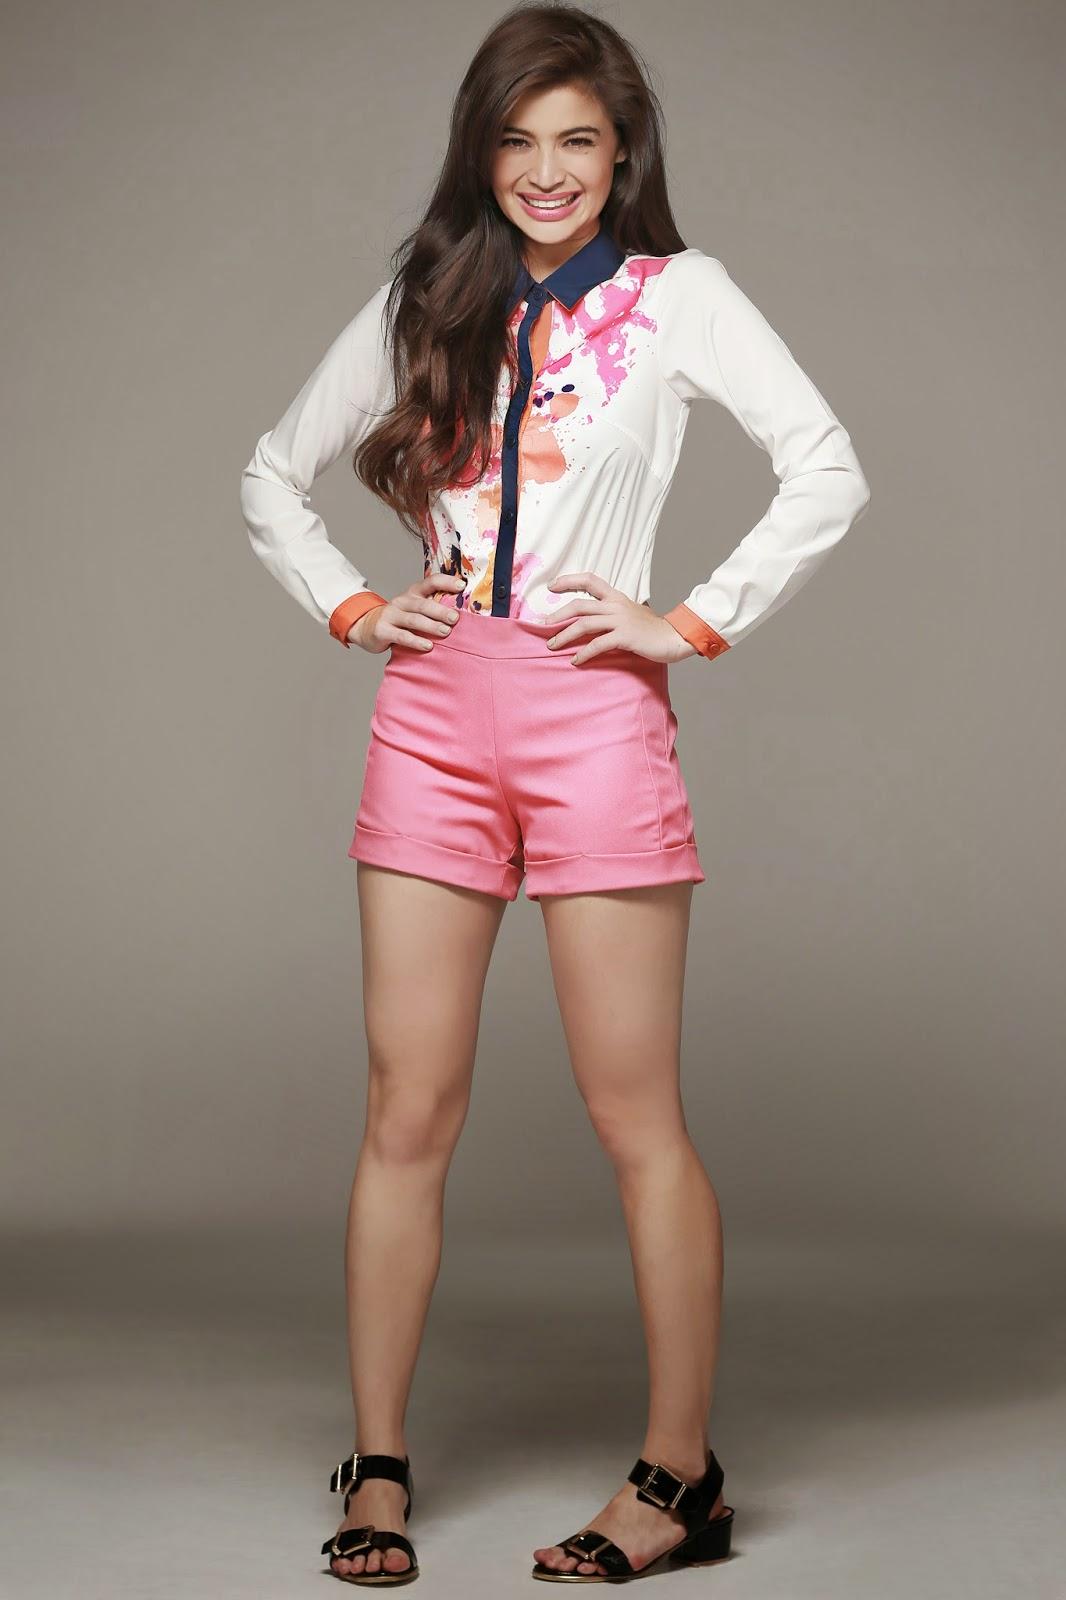 Anne curtis fashion style 7